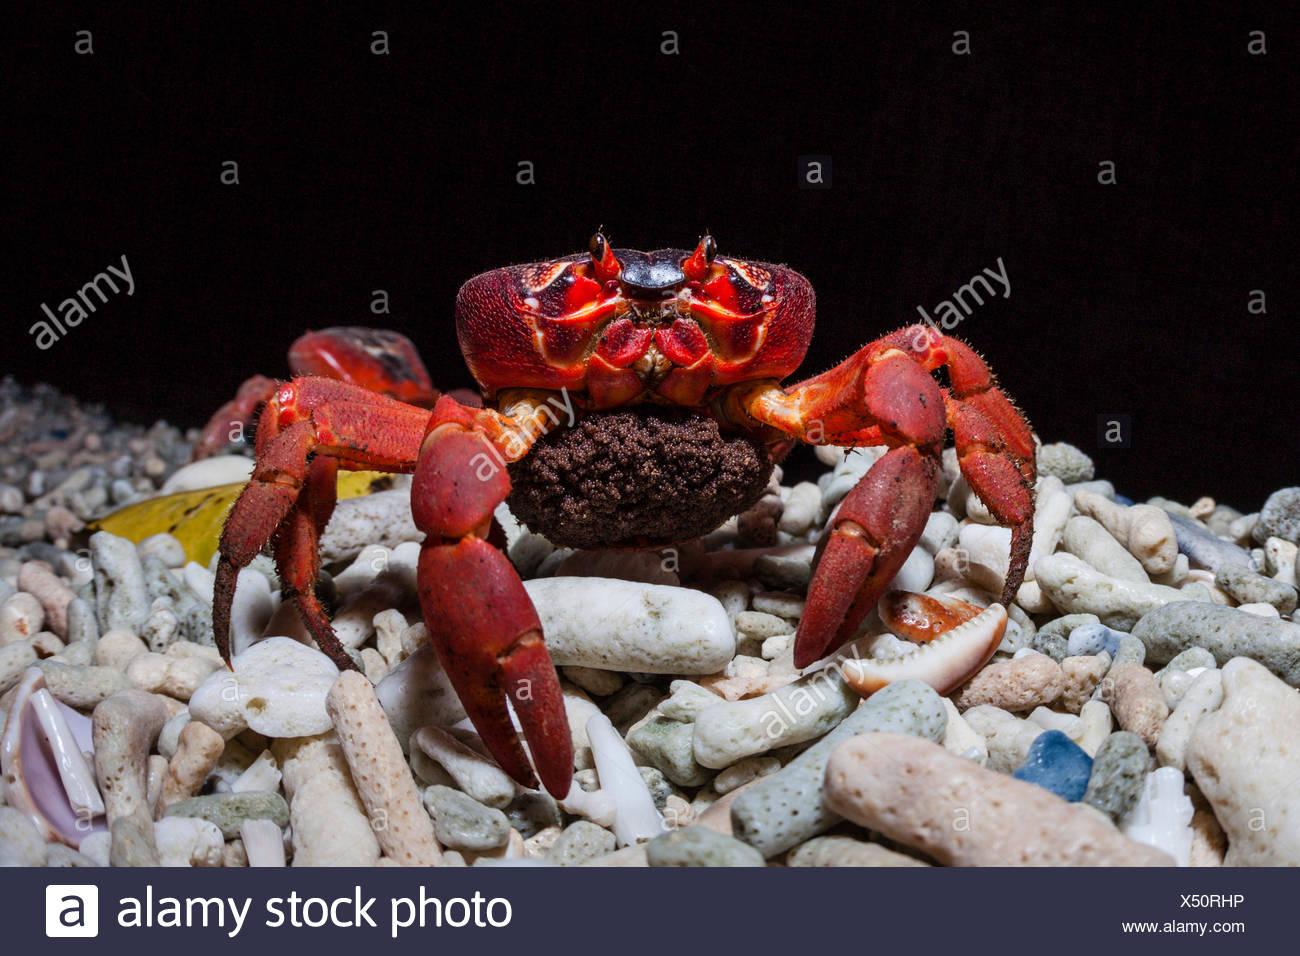 Christmas Island Red Crab migrate for spawning, Gecarcoidea natalis, Christmas Island, Australia - Stock Image